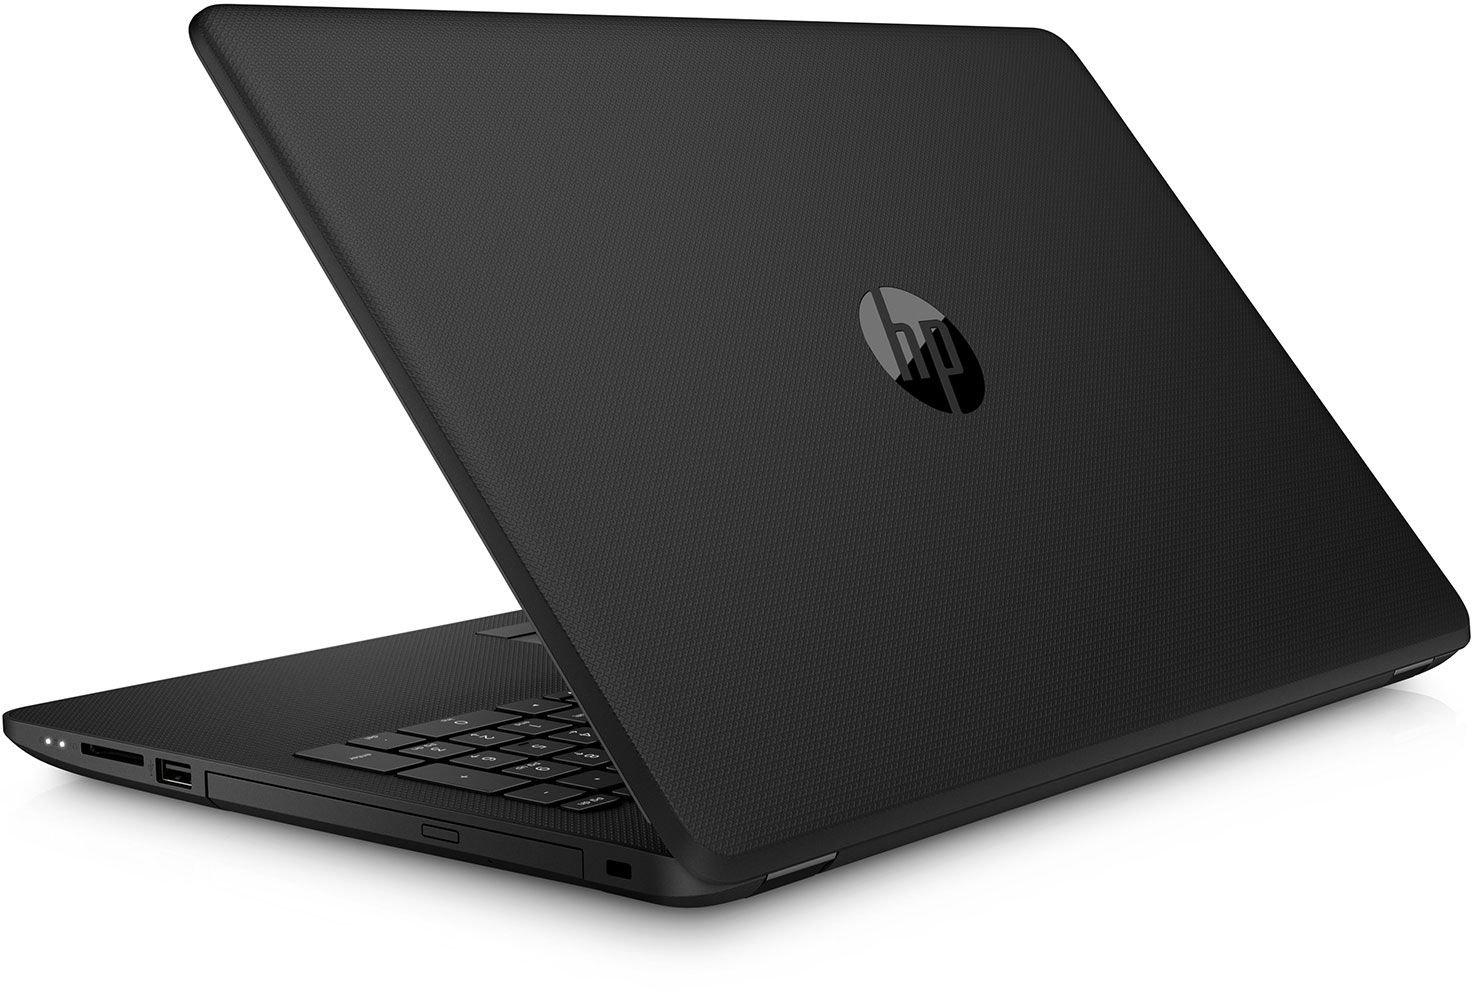 HP HP 15 HP Notebook 15-BS548TU 2017 15 6-inch Laptop (Celeron  N3060/4GB/500GB/Windows 10 Home Single Language(64 bit)/Integrated  Graphics), Jet Black